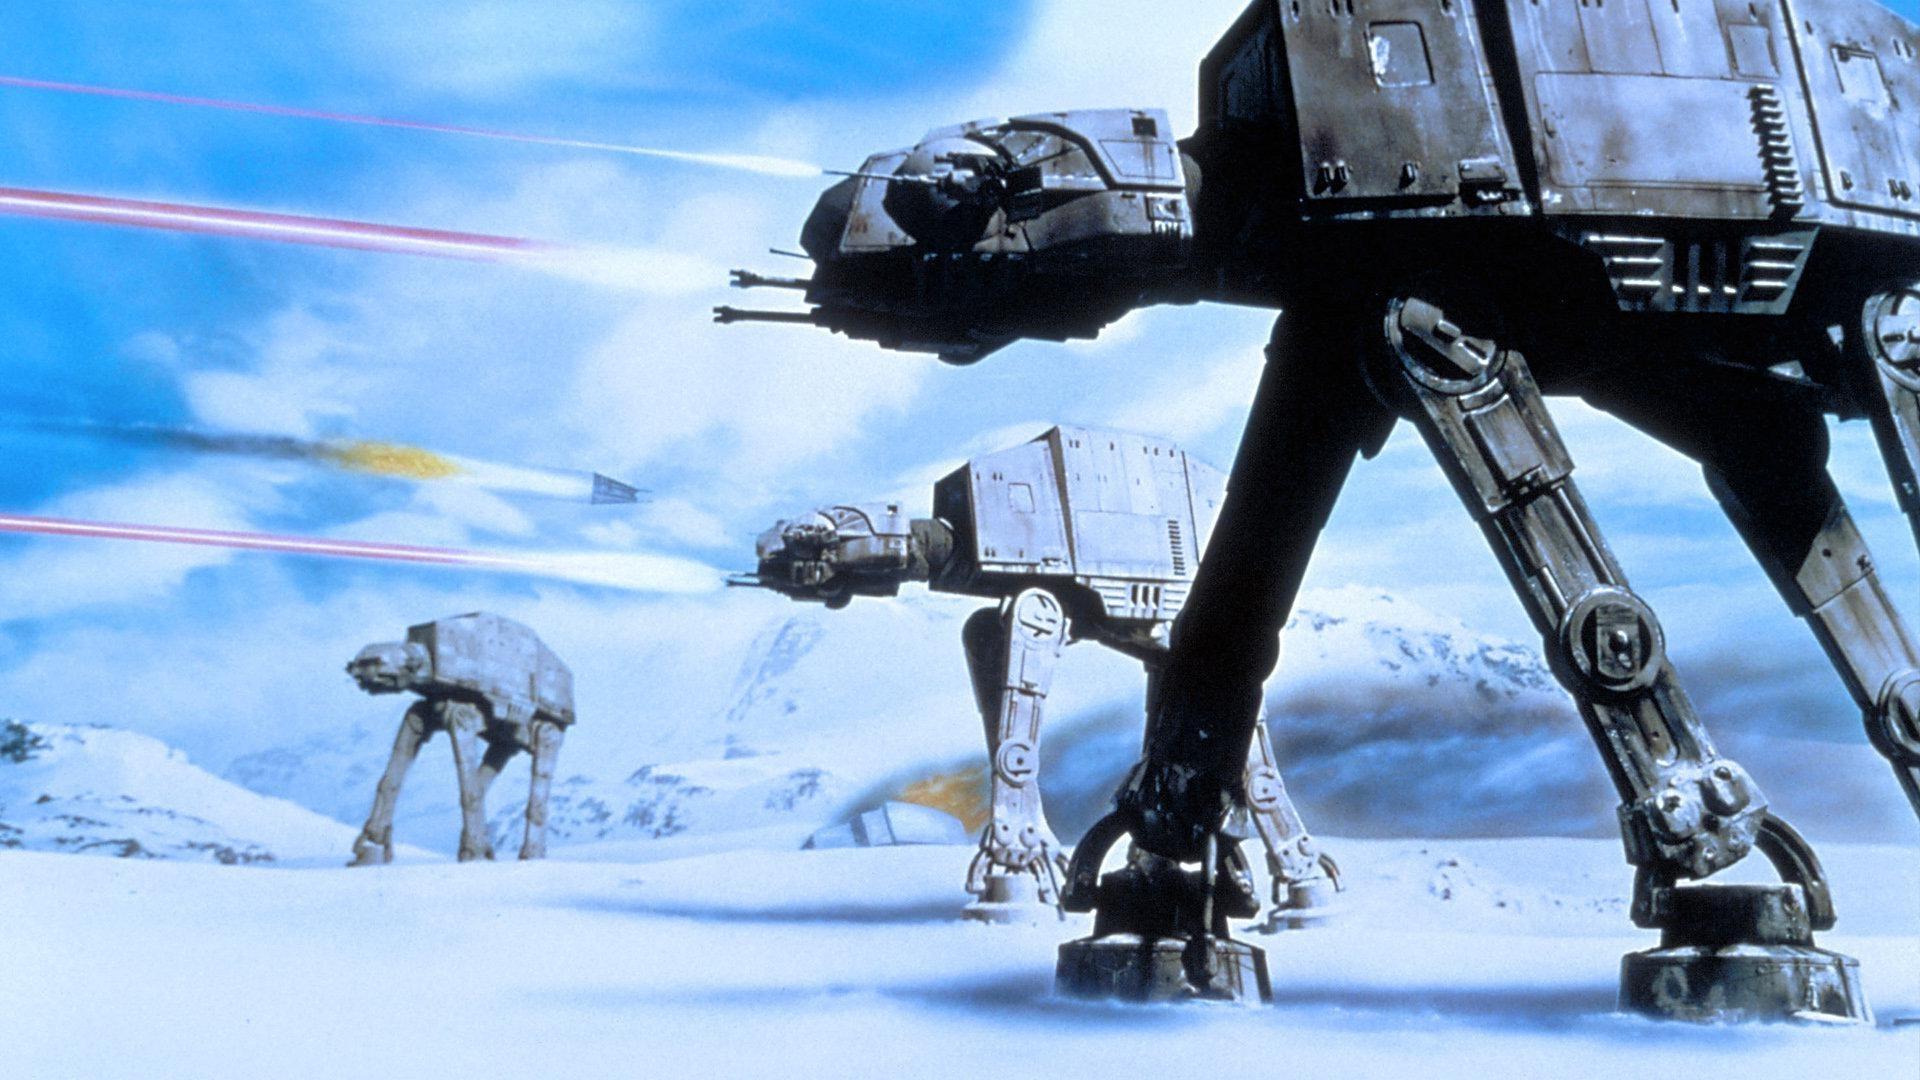 Star-Wars-snow-winter-vehicle-movies-Sta